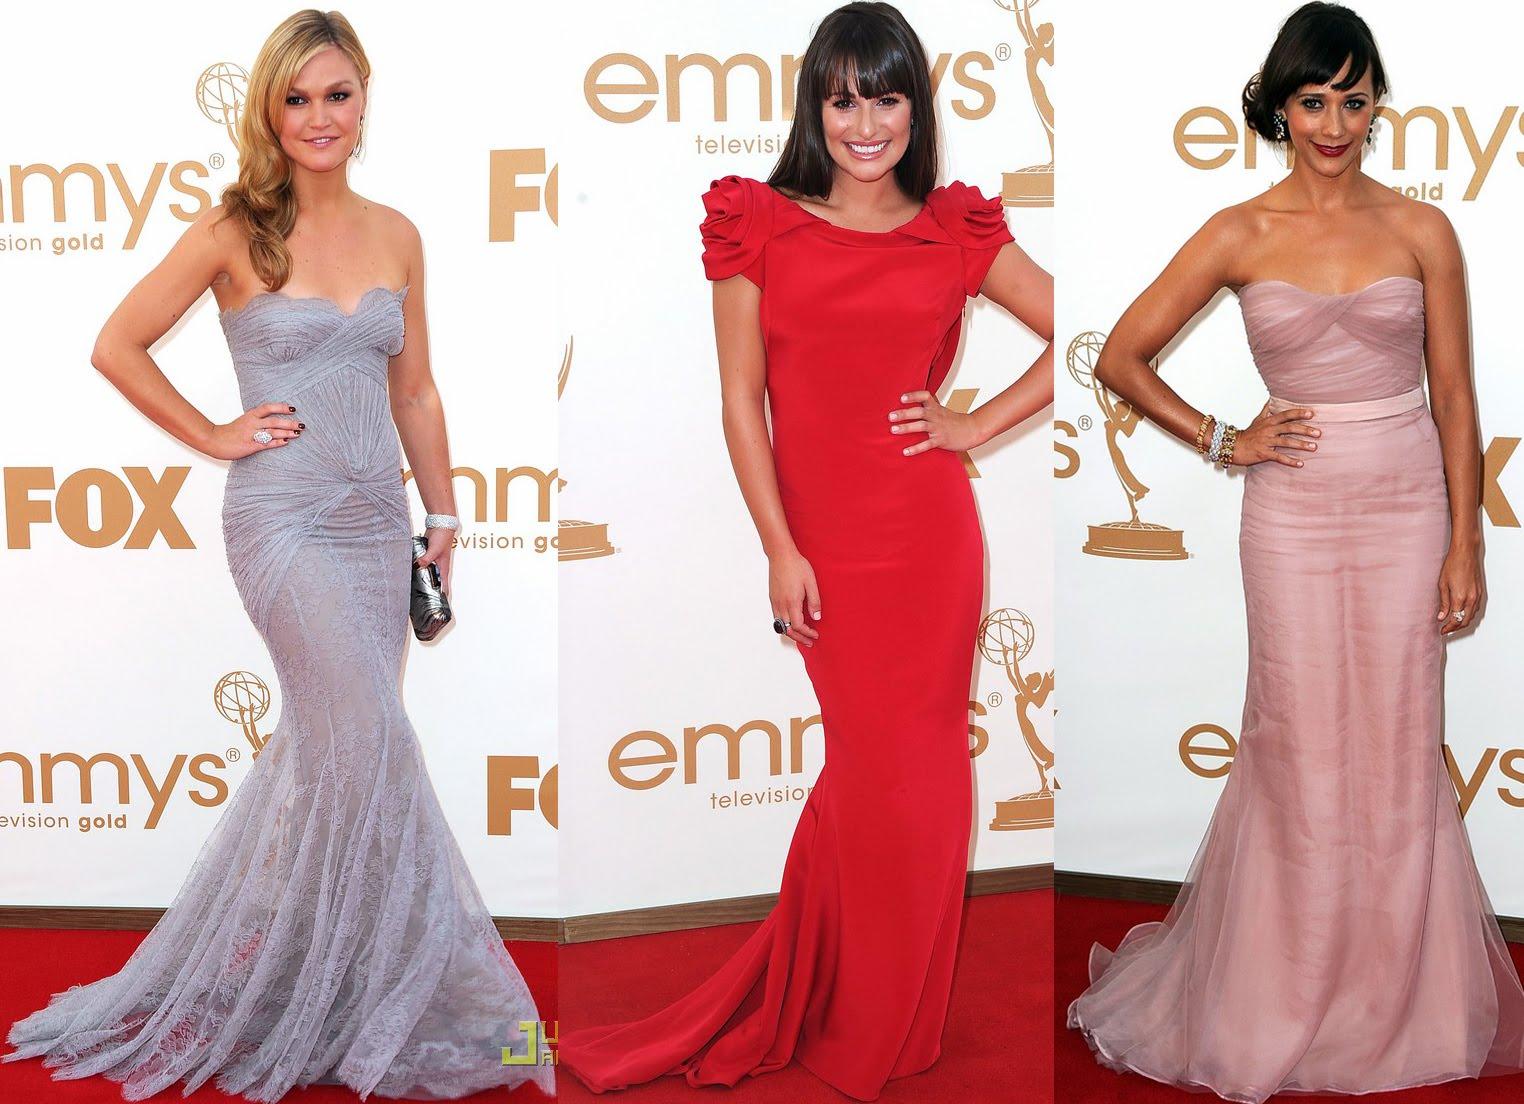 http://1.bp.blogspot.com/-tNW3VQ35wPM/TndZENMnH1I/AAAAAAAAByQ/gwA-mU4Zc80/s1600/julia-stiles-2011-emmy-awards-red-carpet-02.jpg